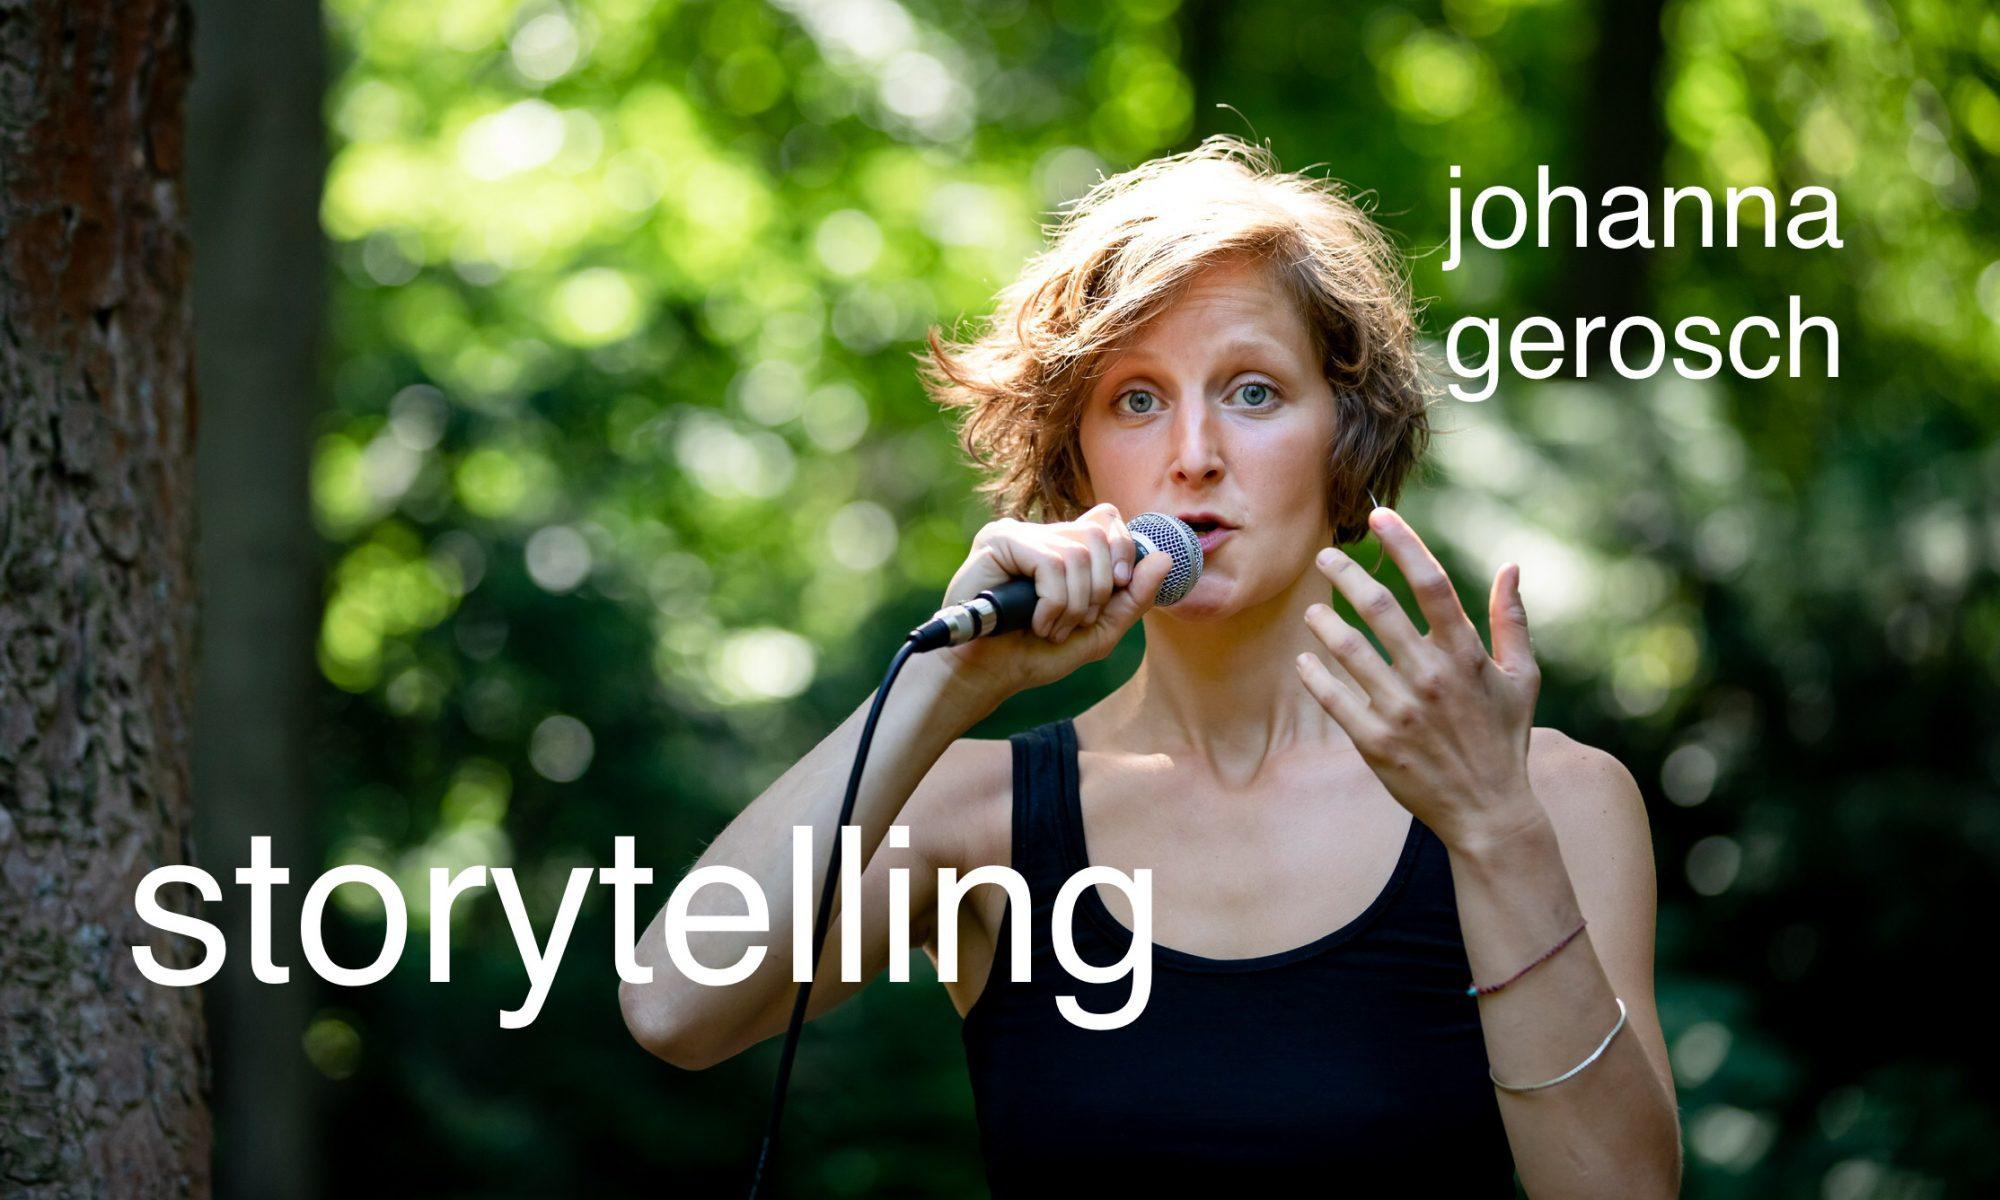 johanna gerosch          //      storytelling